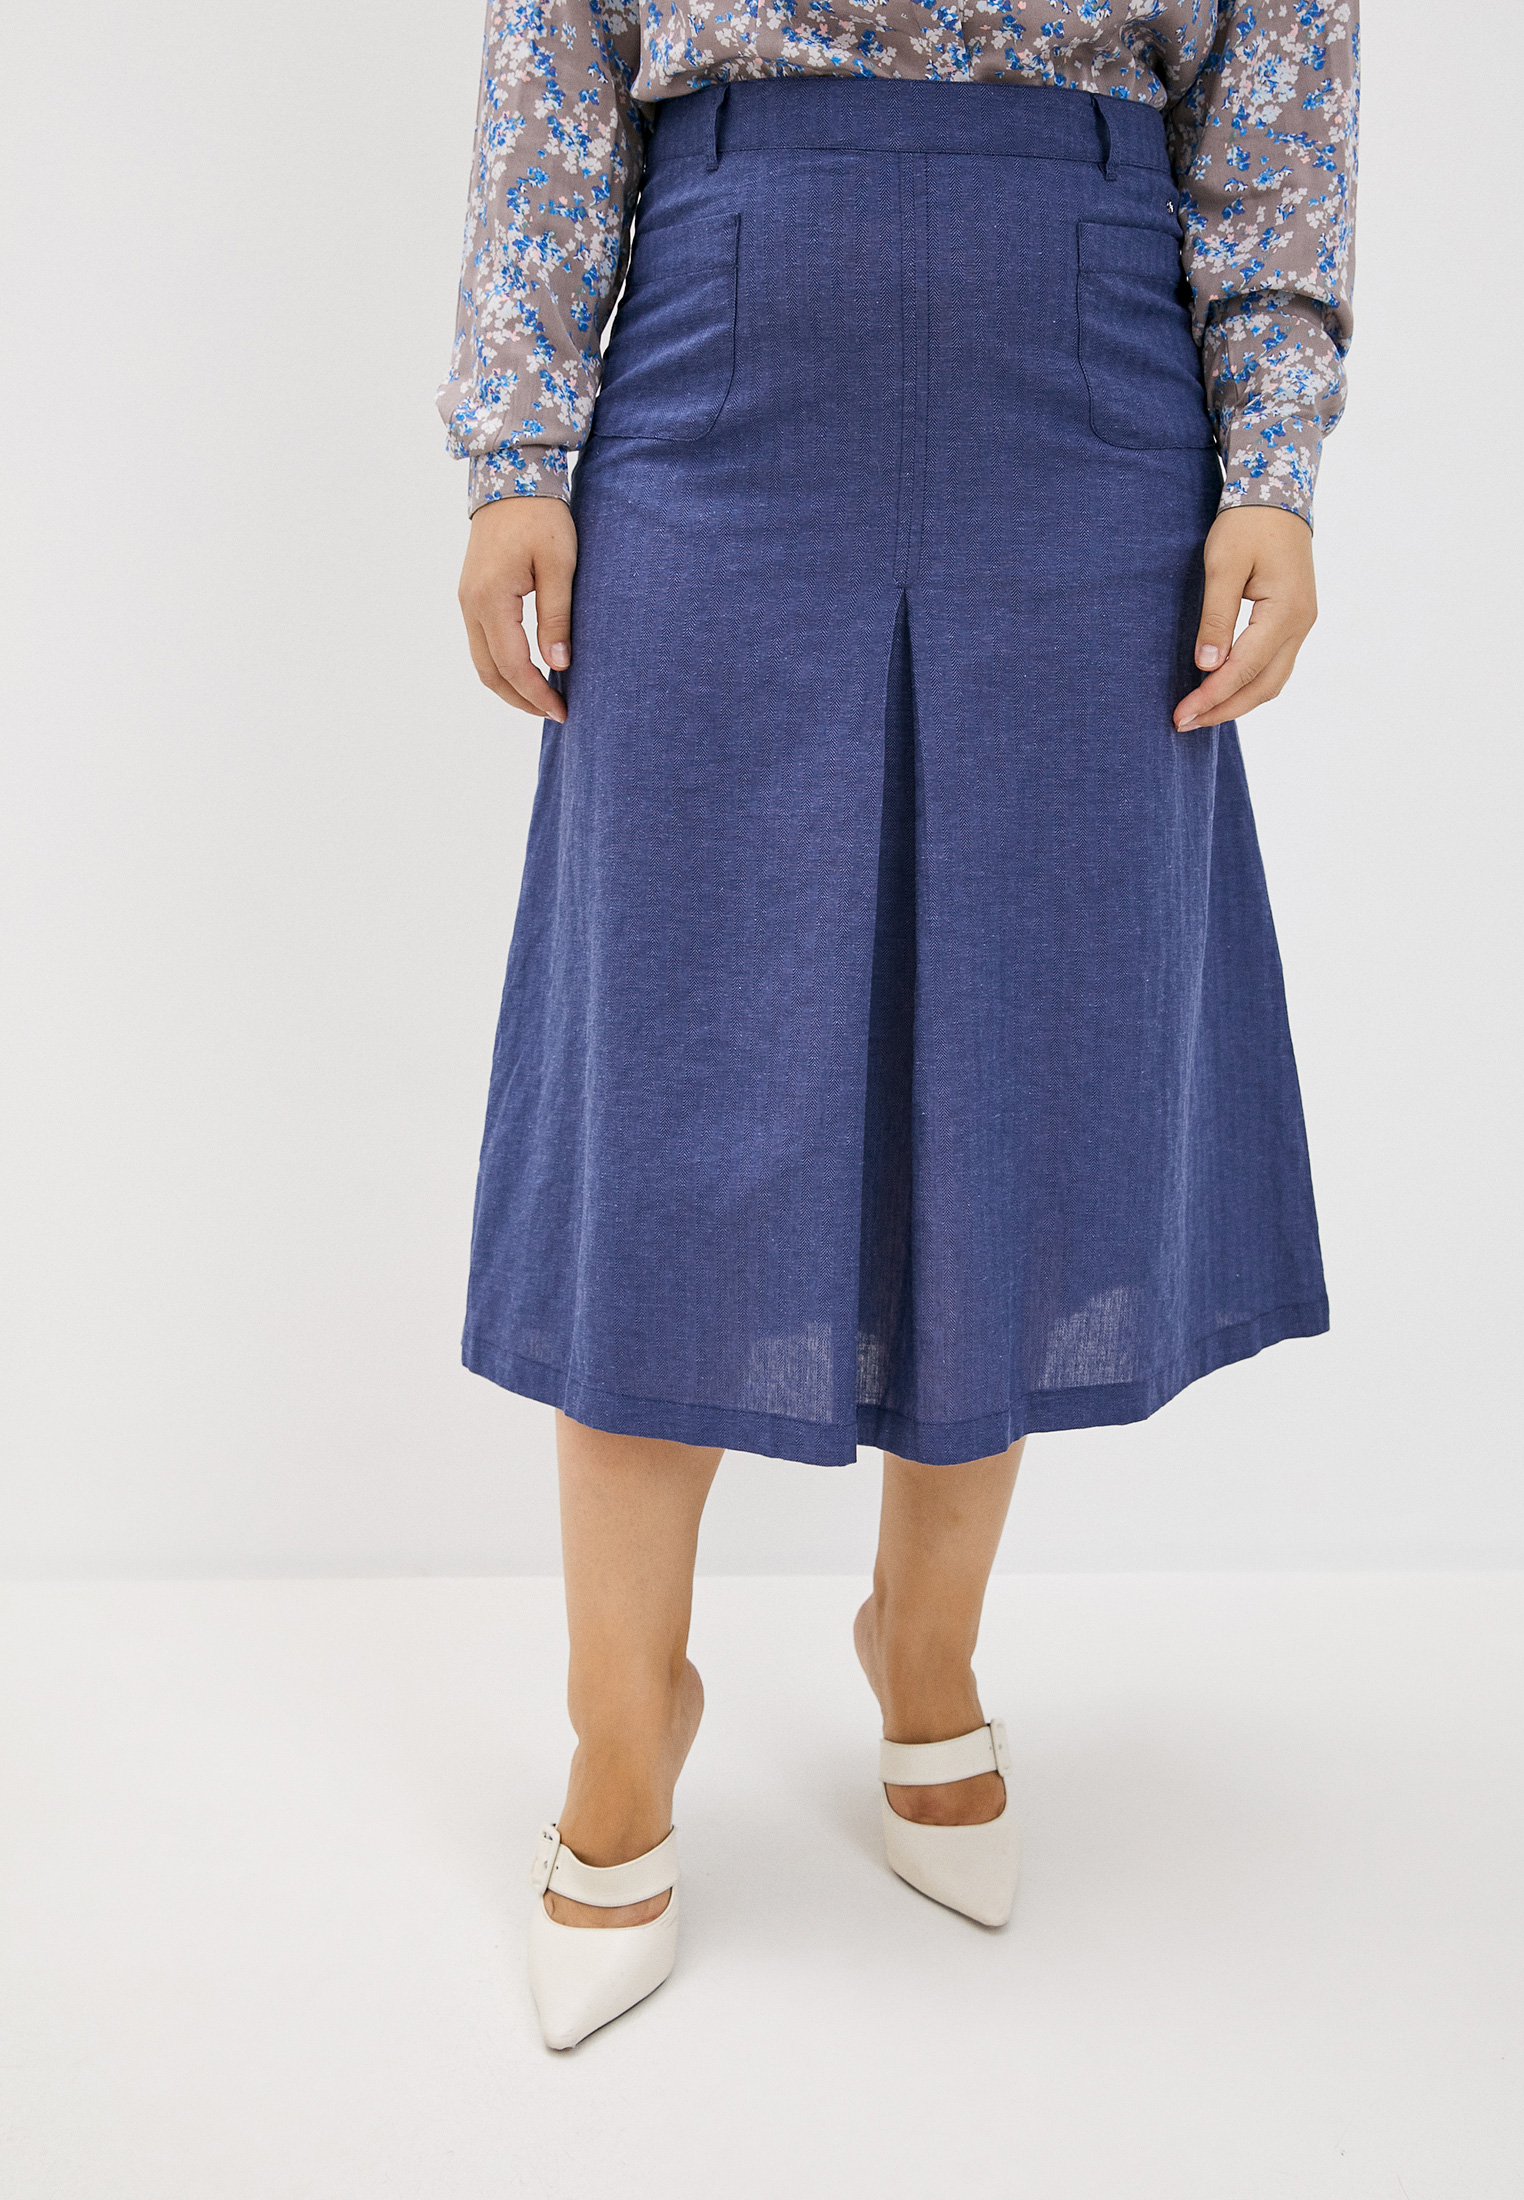 Широкая юбка Finn Flare (Фин Флаер) S19-12029